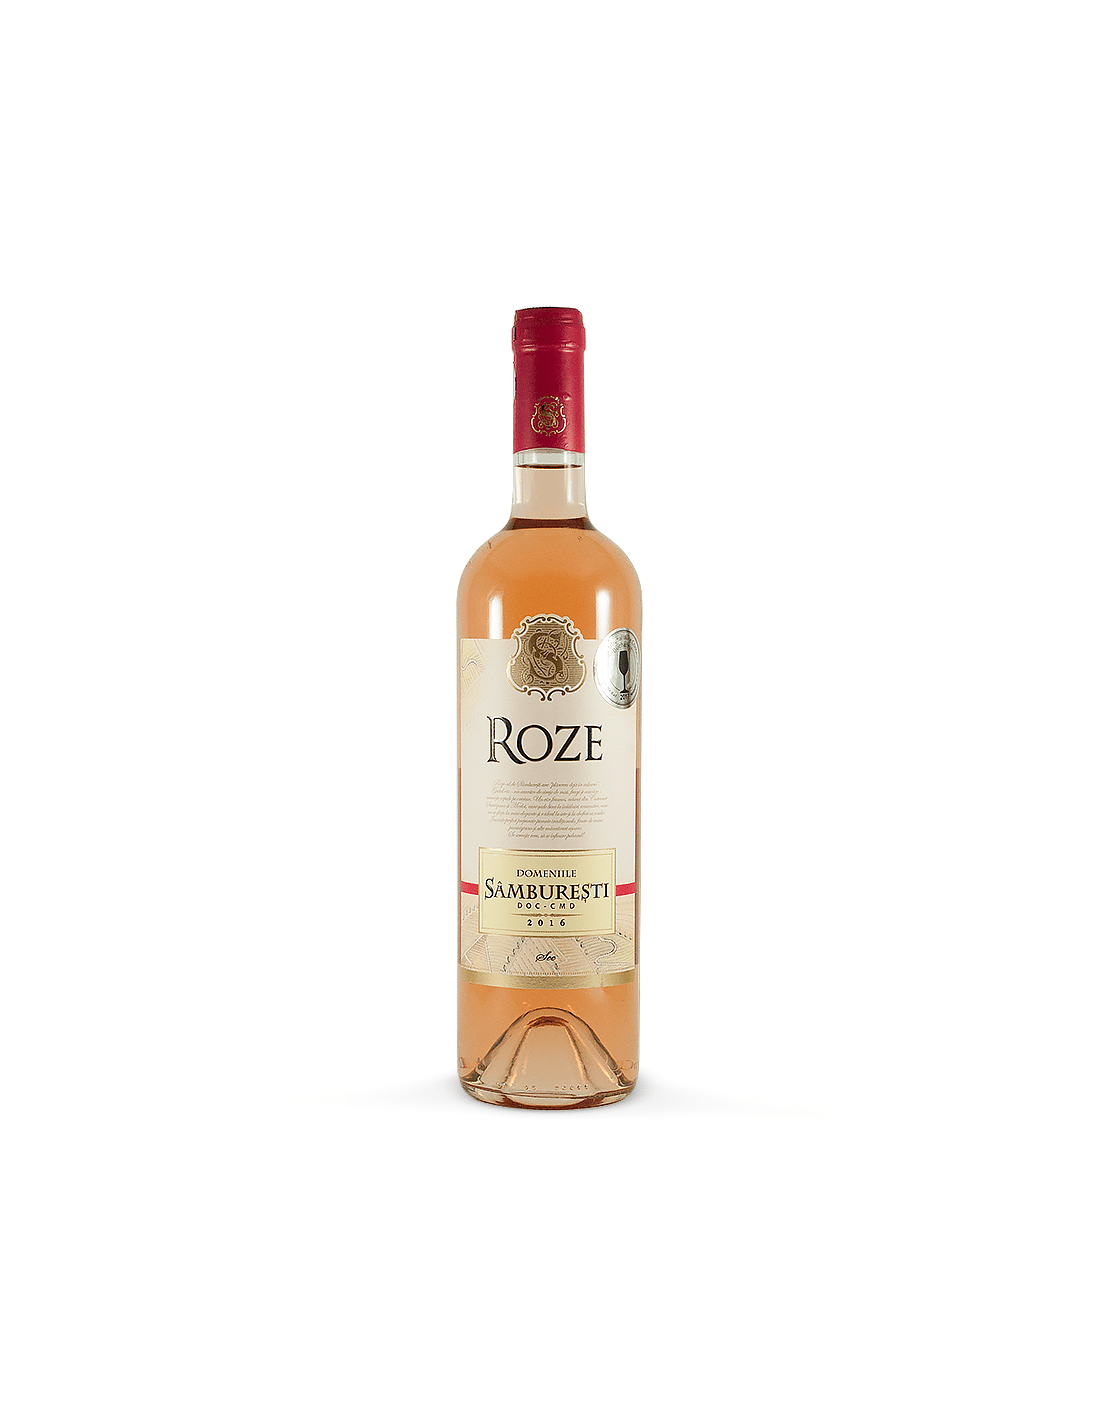 Vin roze sec, Cabernet Sauvignon, Domeniile Samburesti, 14% alc., 0.75L, Romania